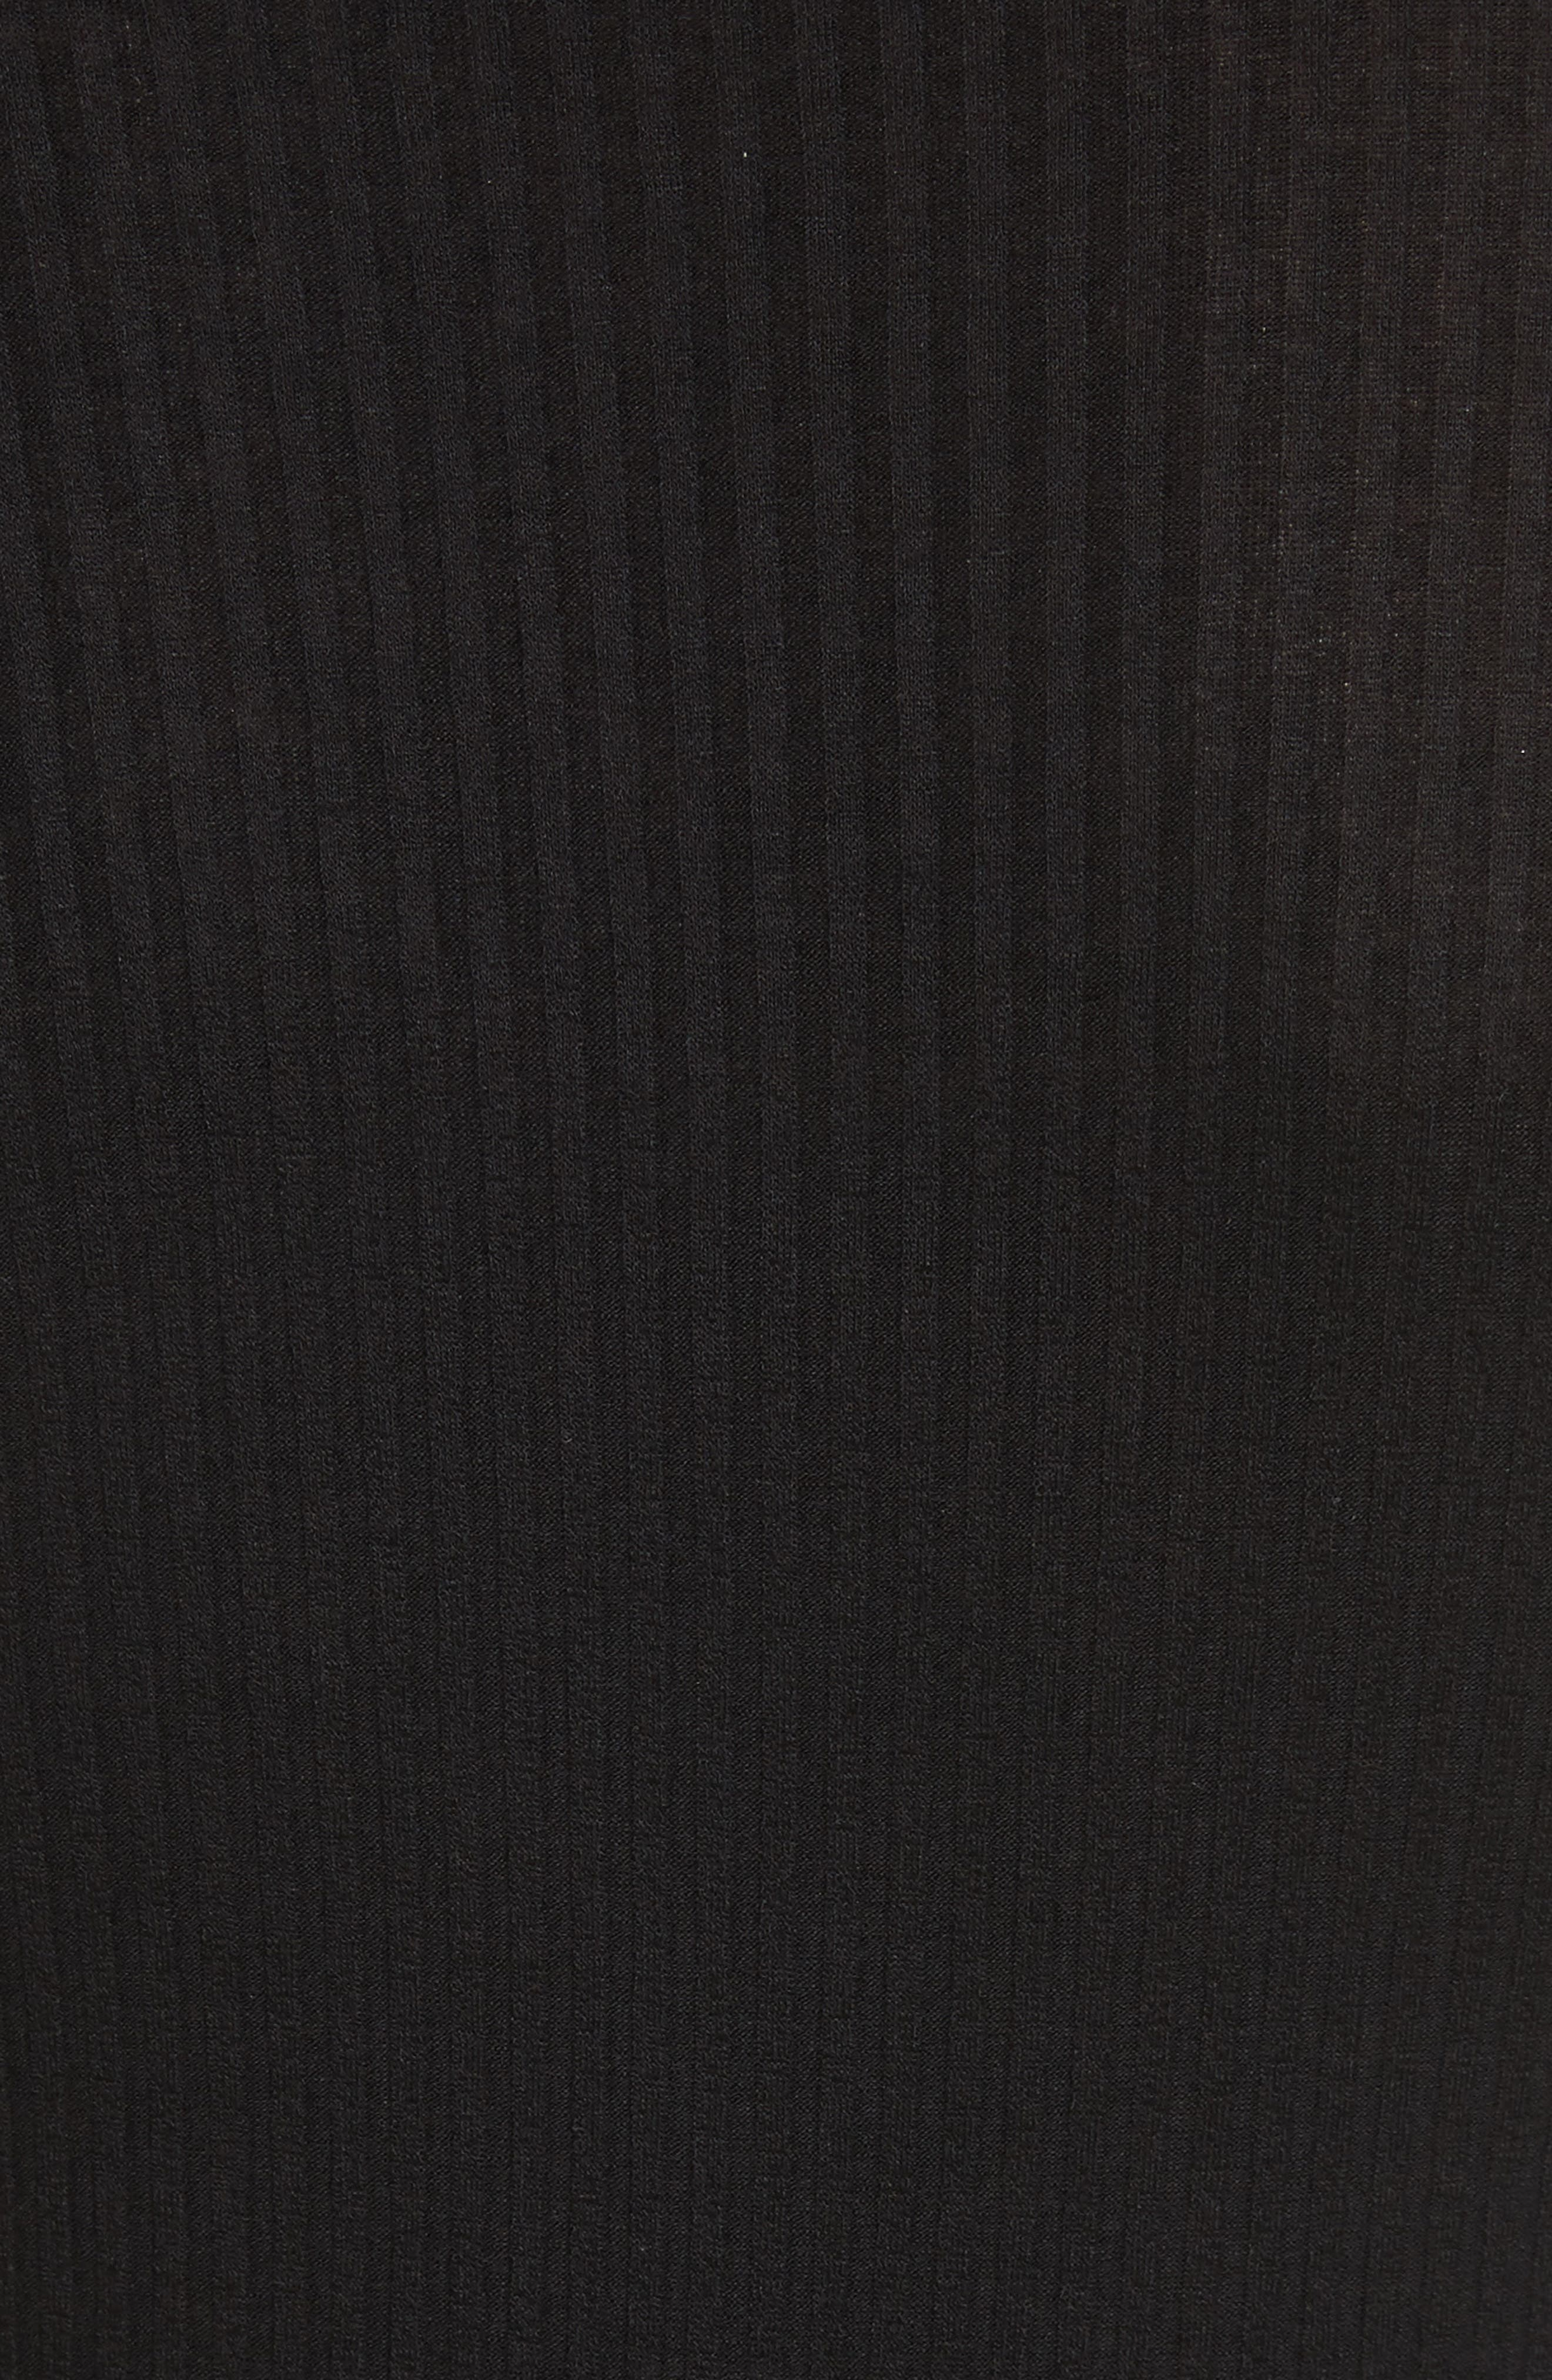 Rooney Cutout Dress,                             Alternate thumbnail 5, color,                             Black